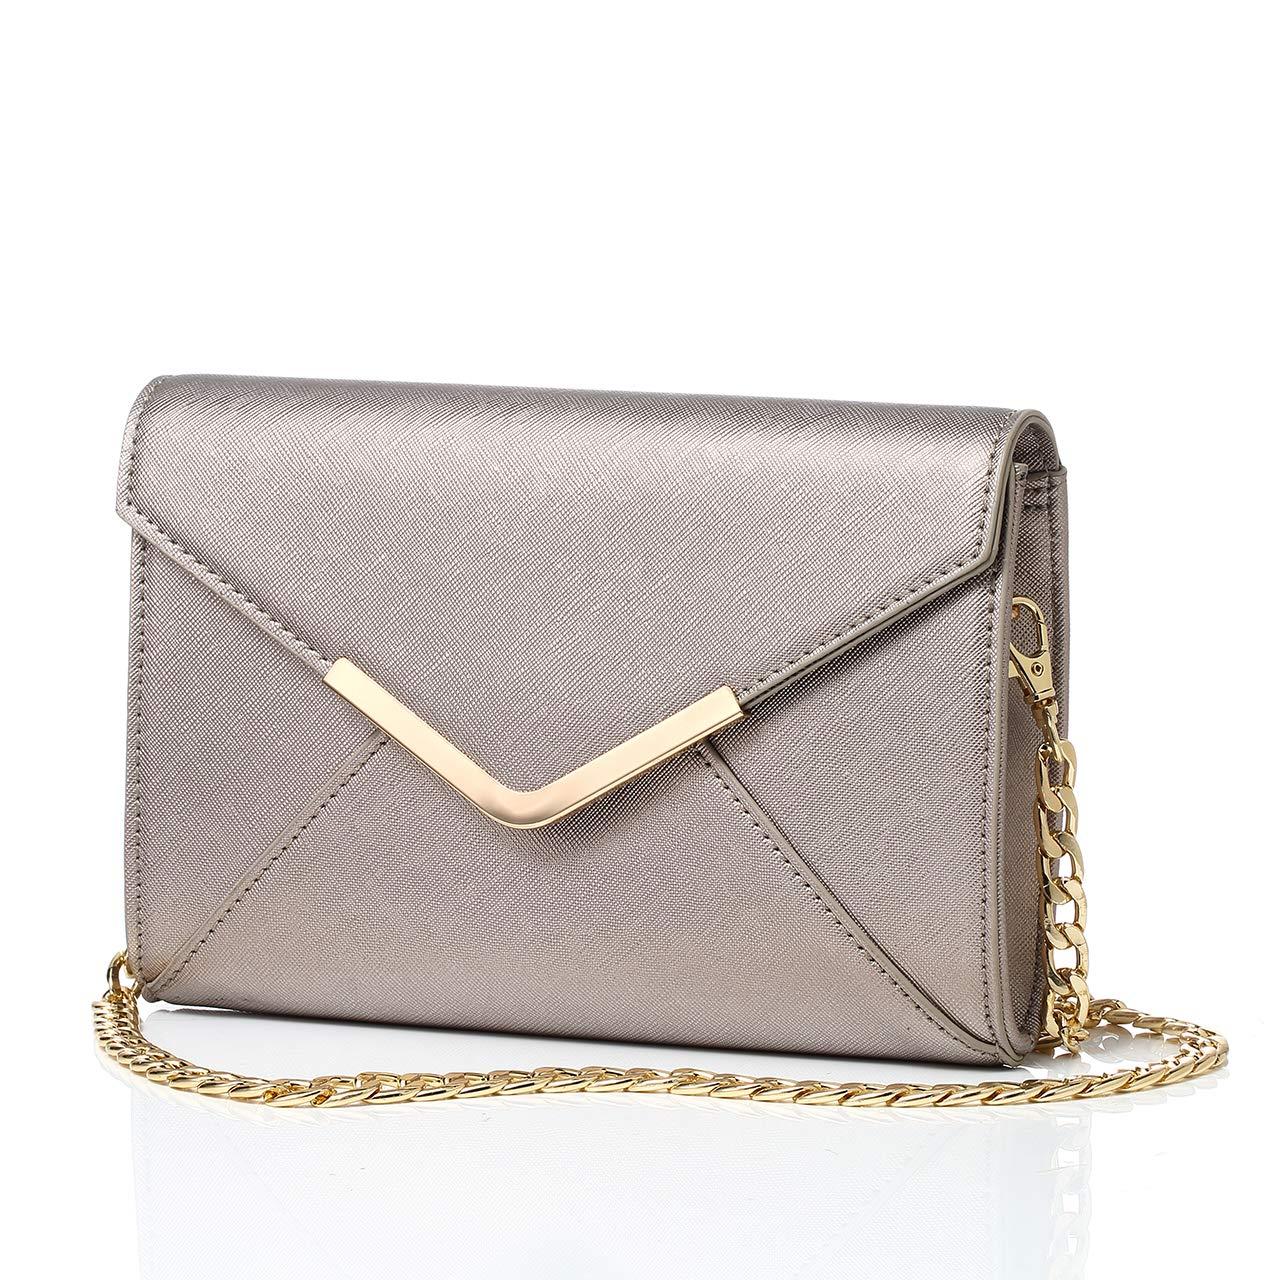 3dac42f35eb DeDe Diva Women's Clutch Bag, Envelope Evening Bag Clutch Purse for Women,  Crossbody Shoulder Bag Handbags for Party Wedding